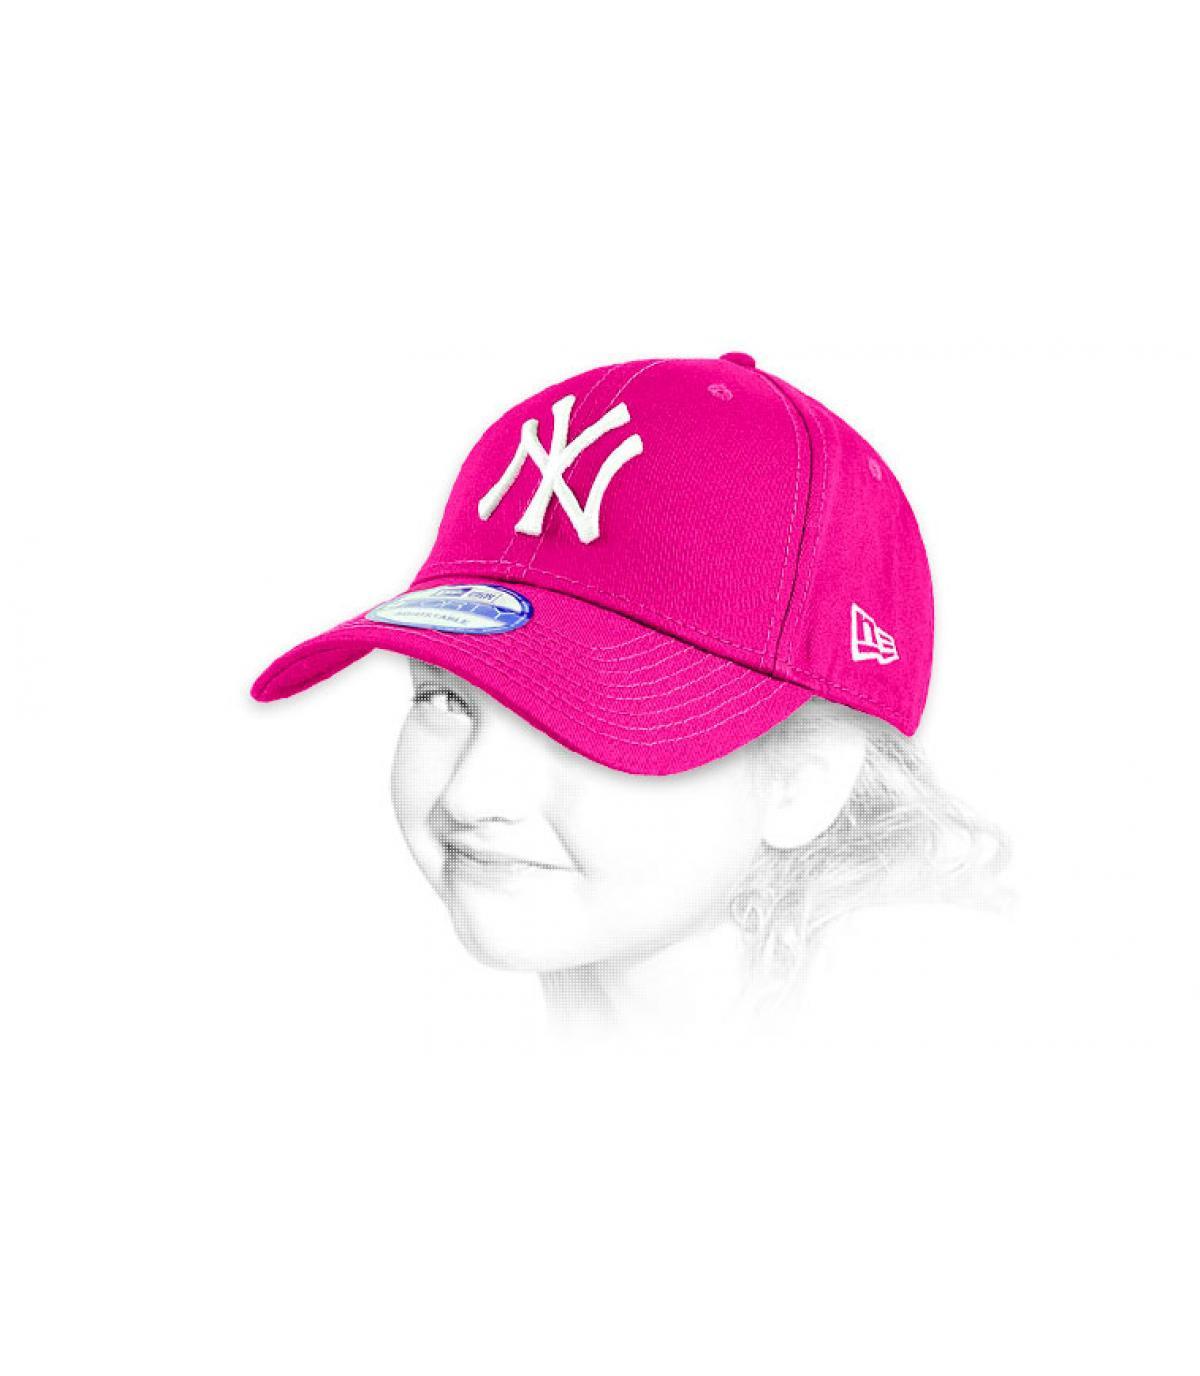 Dettagli Child trucker ny pink - image 2